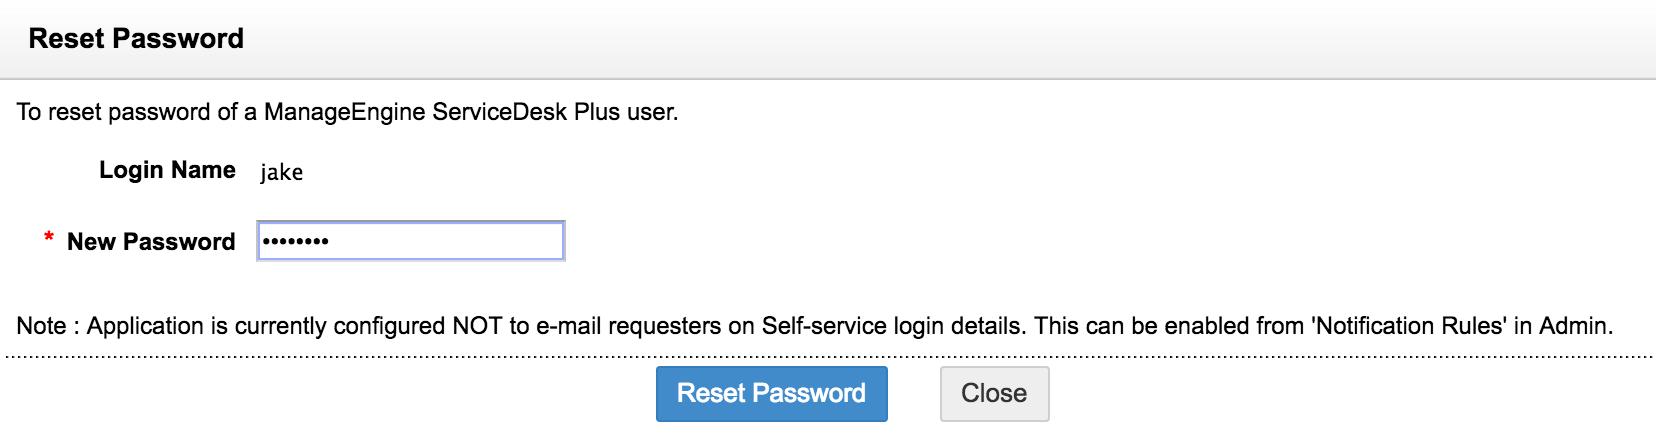 Configure requesters | Help desk customizer - SDP help desk